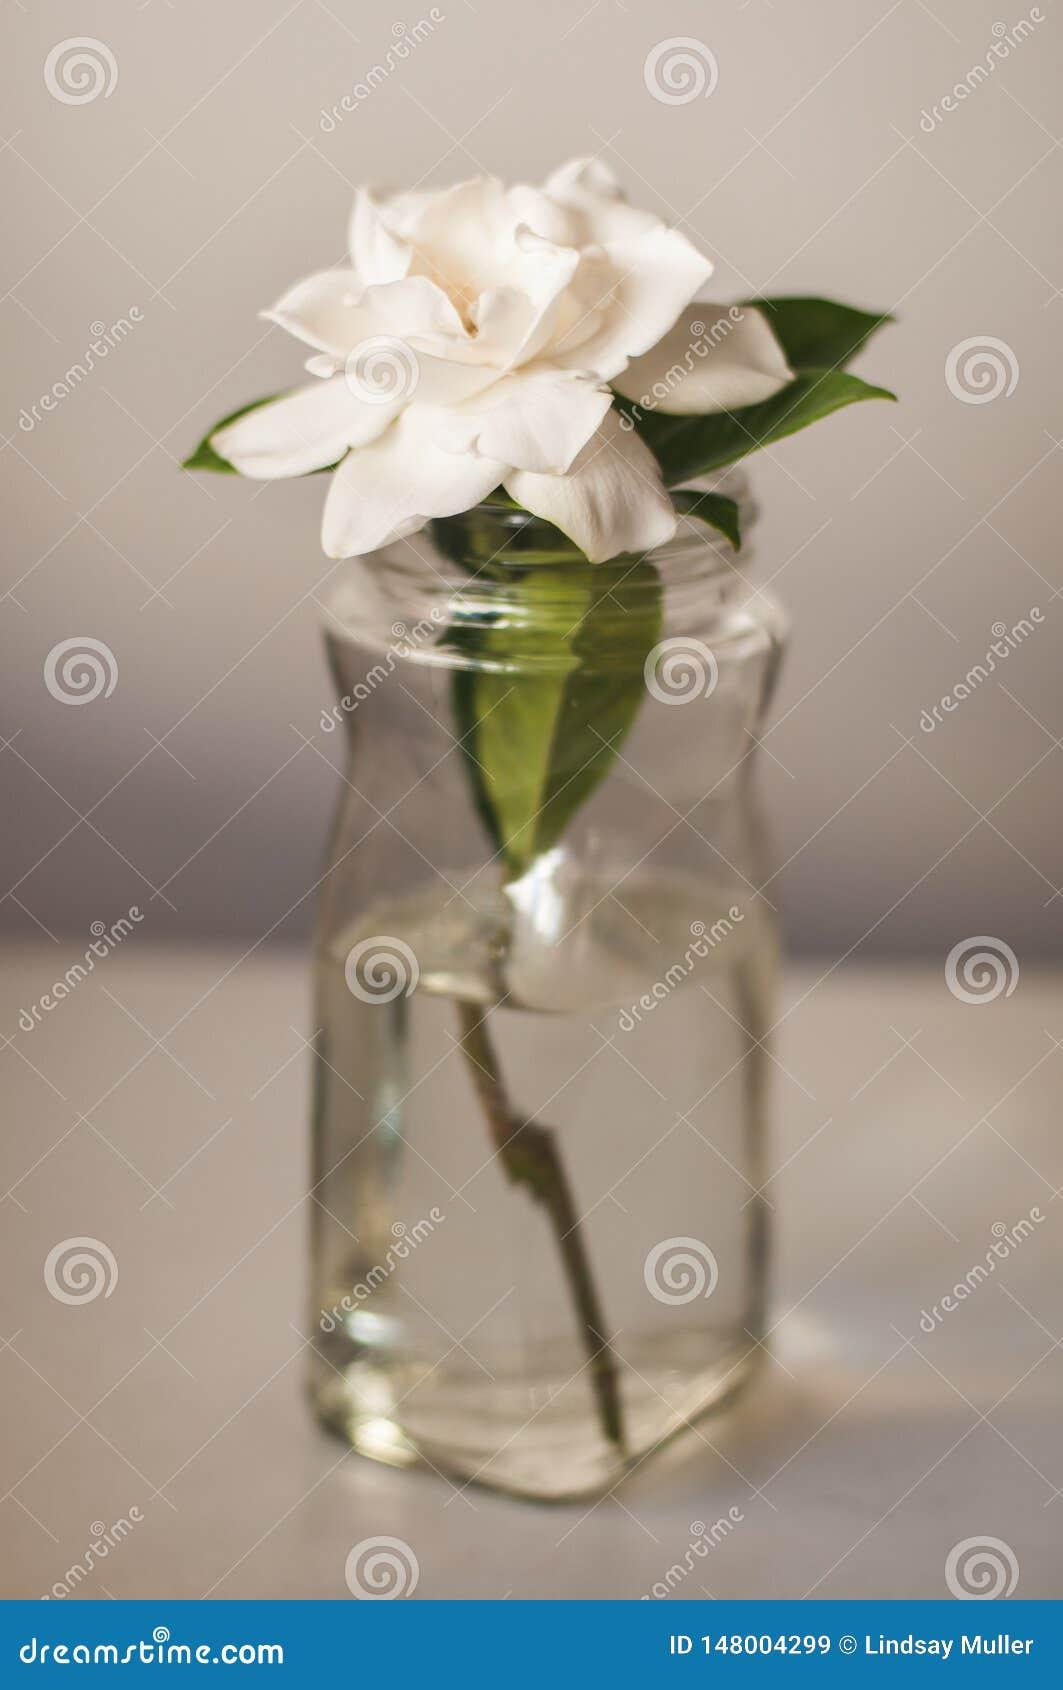 Fleur blanche de magnolia dans le vase en verre